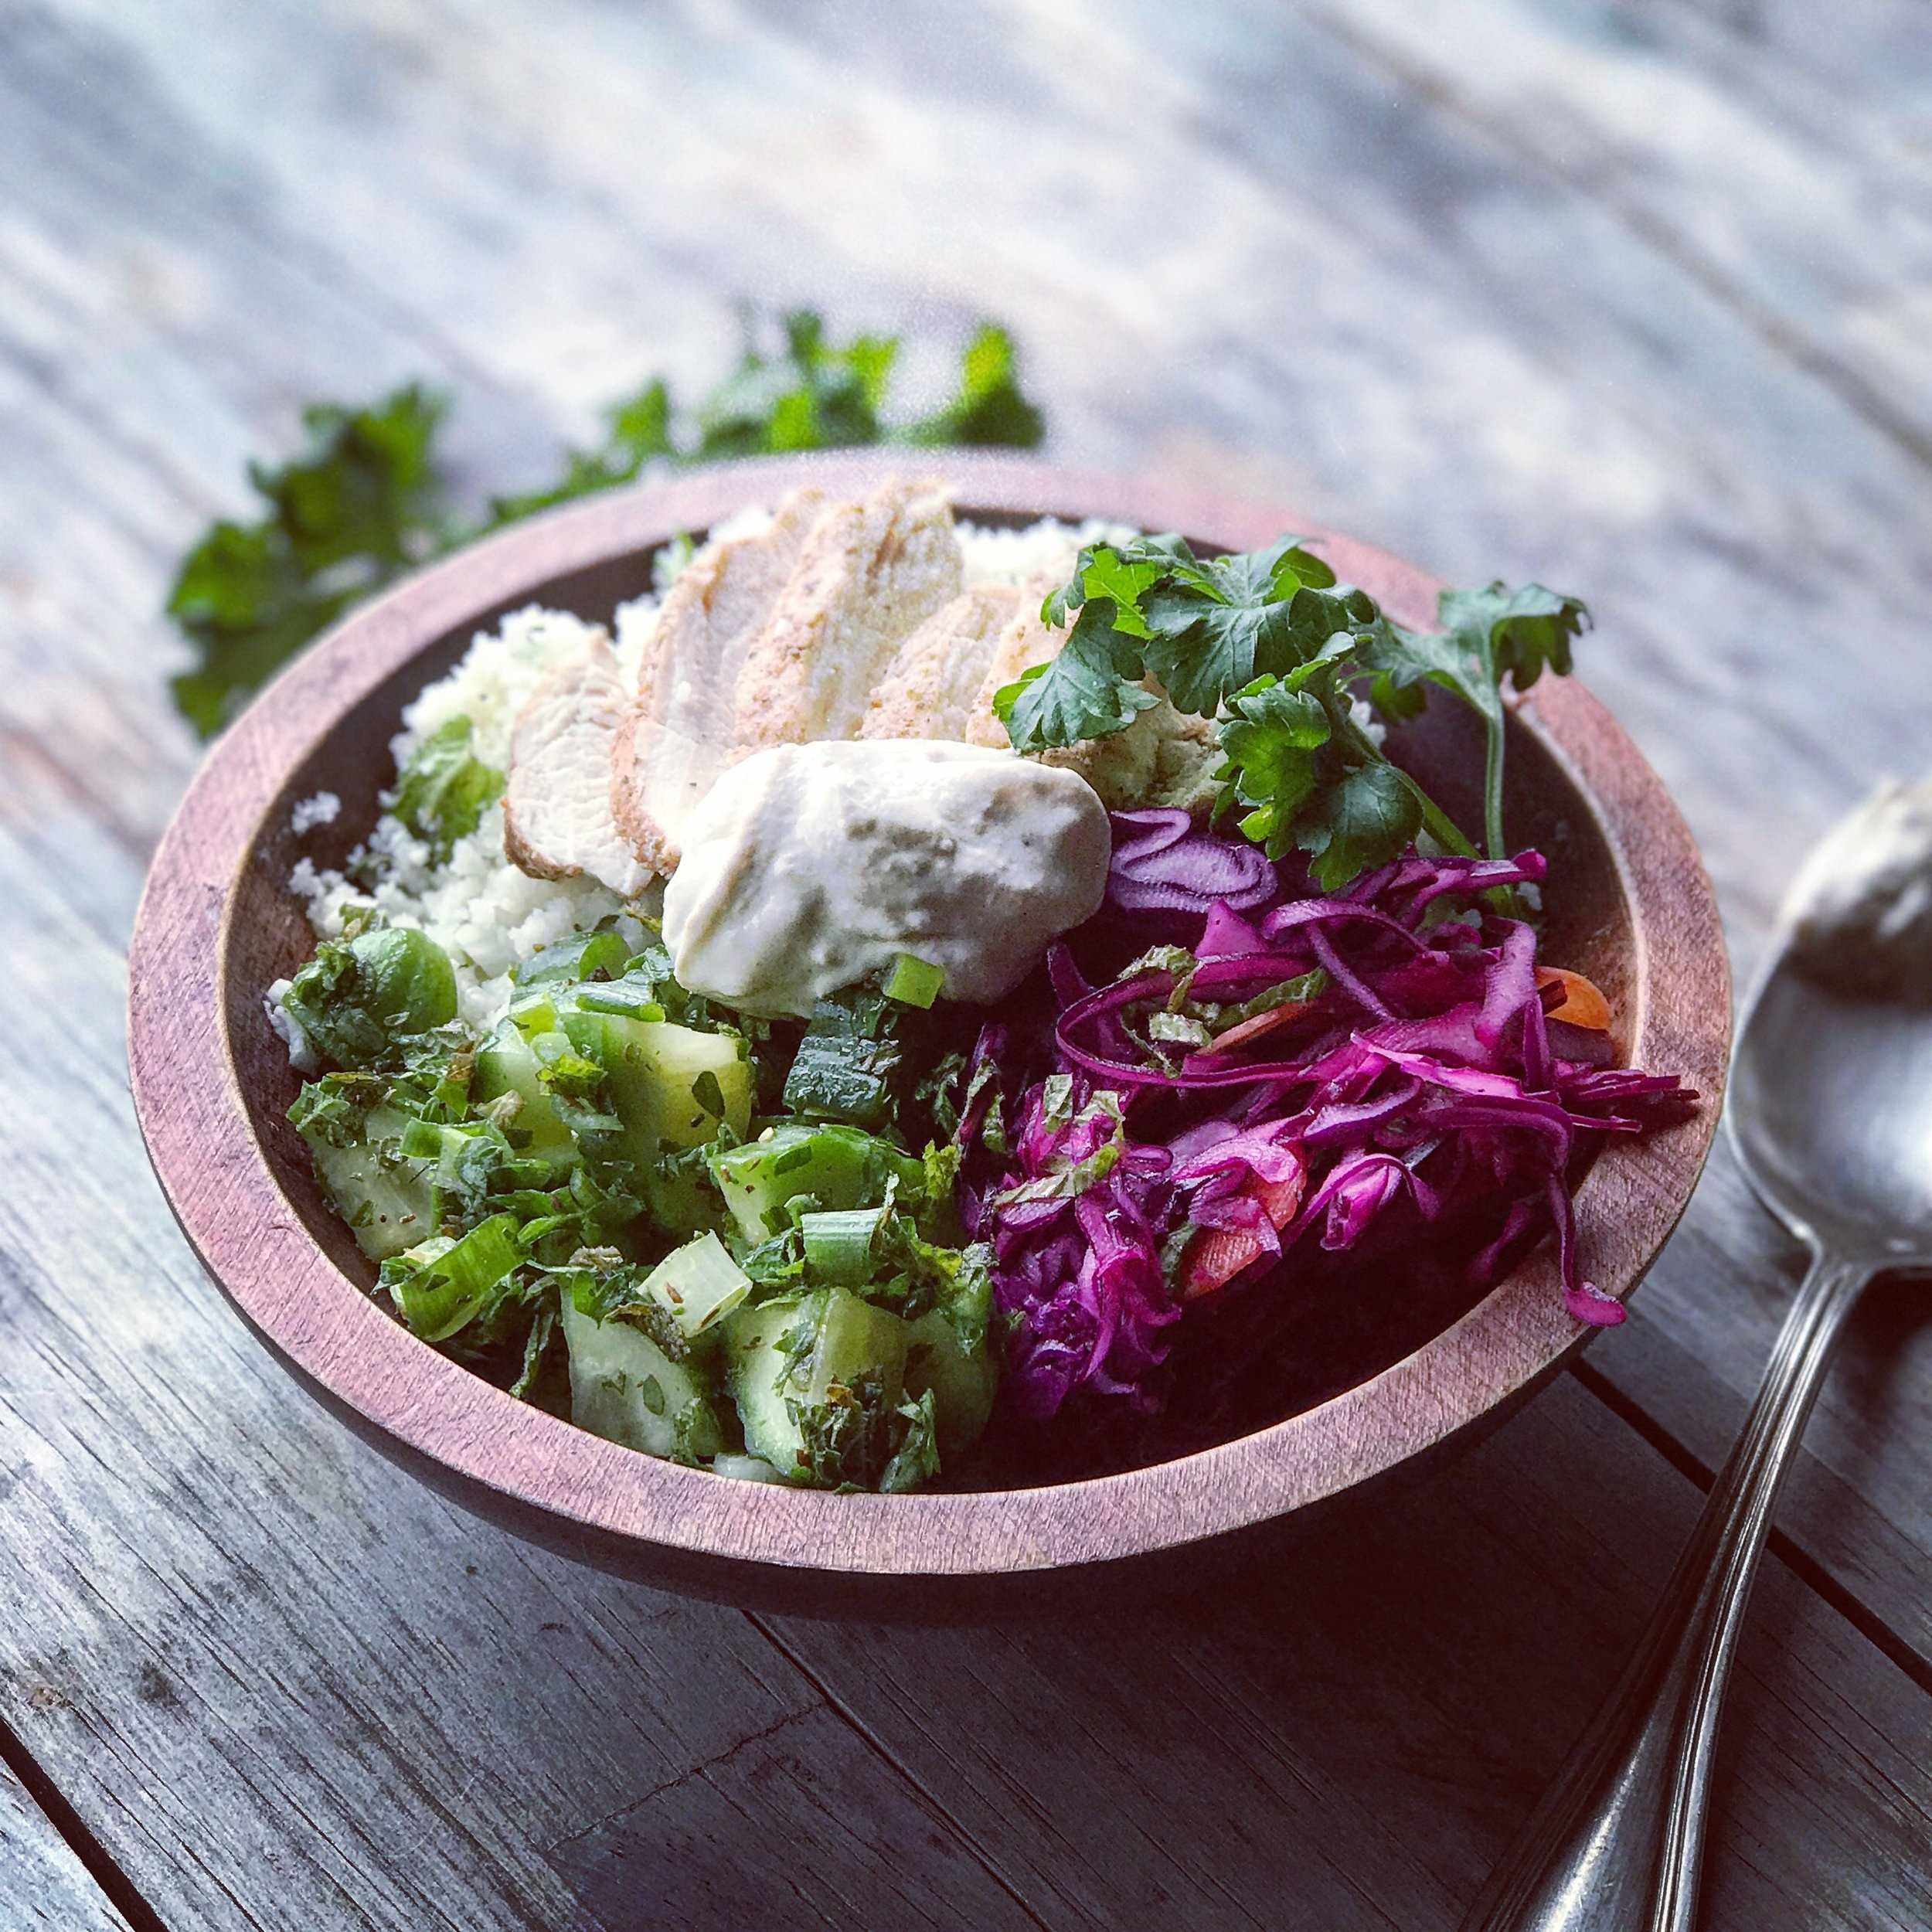 Bone Broth Chicken Shawarma Bowl recipe made from chicken bone broth created by Bone Brewhouse.